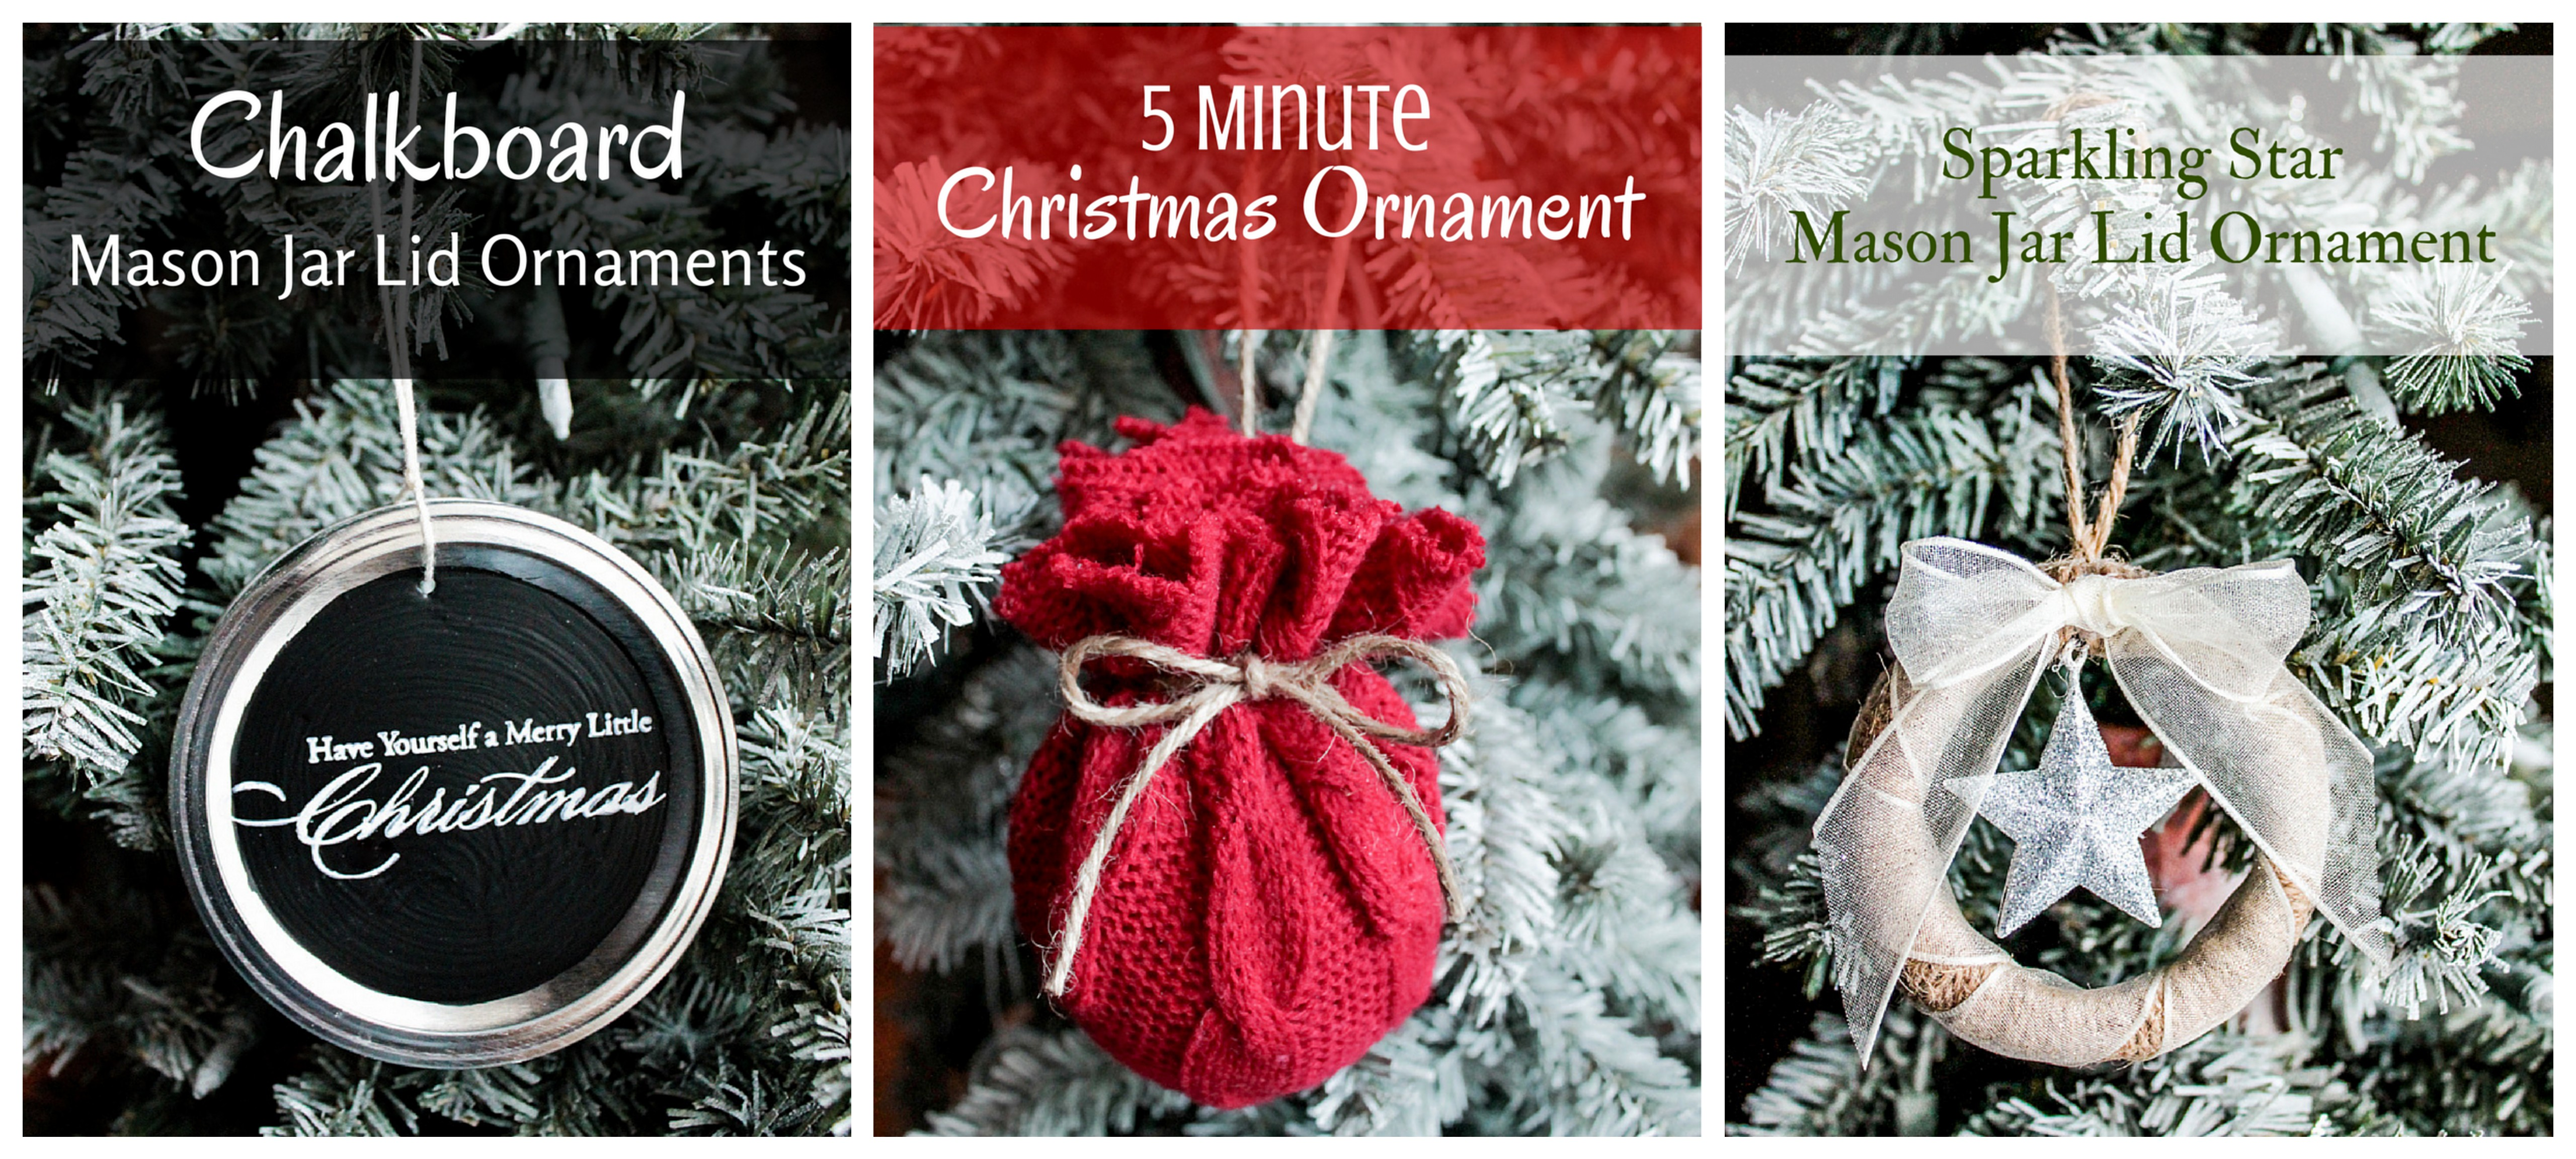 3 New Ornaments